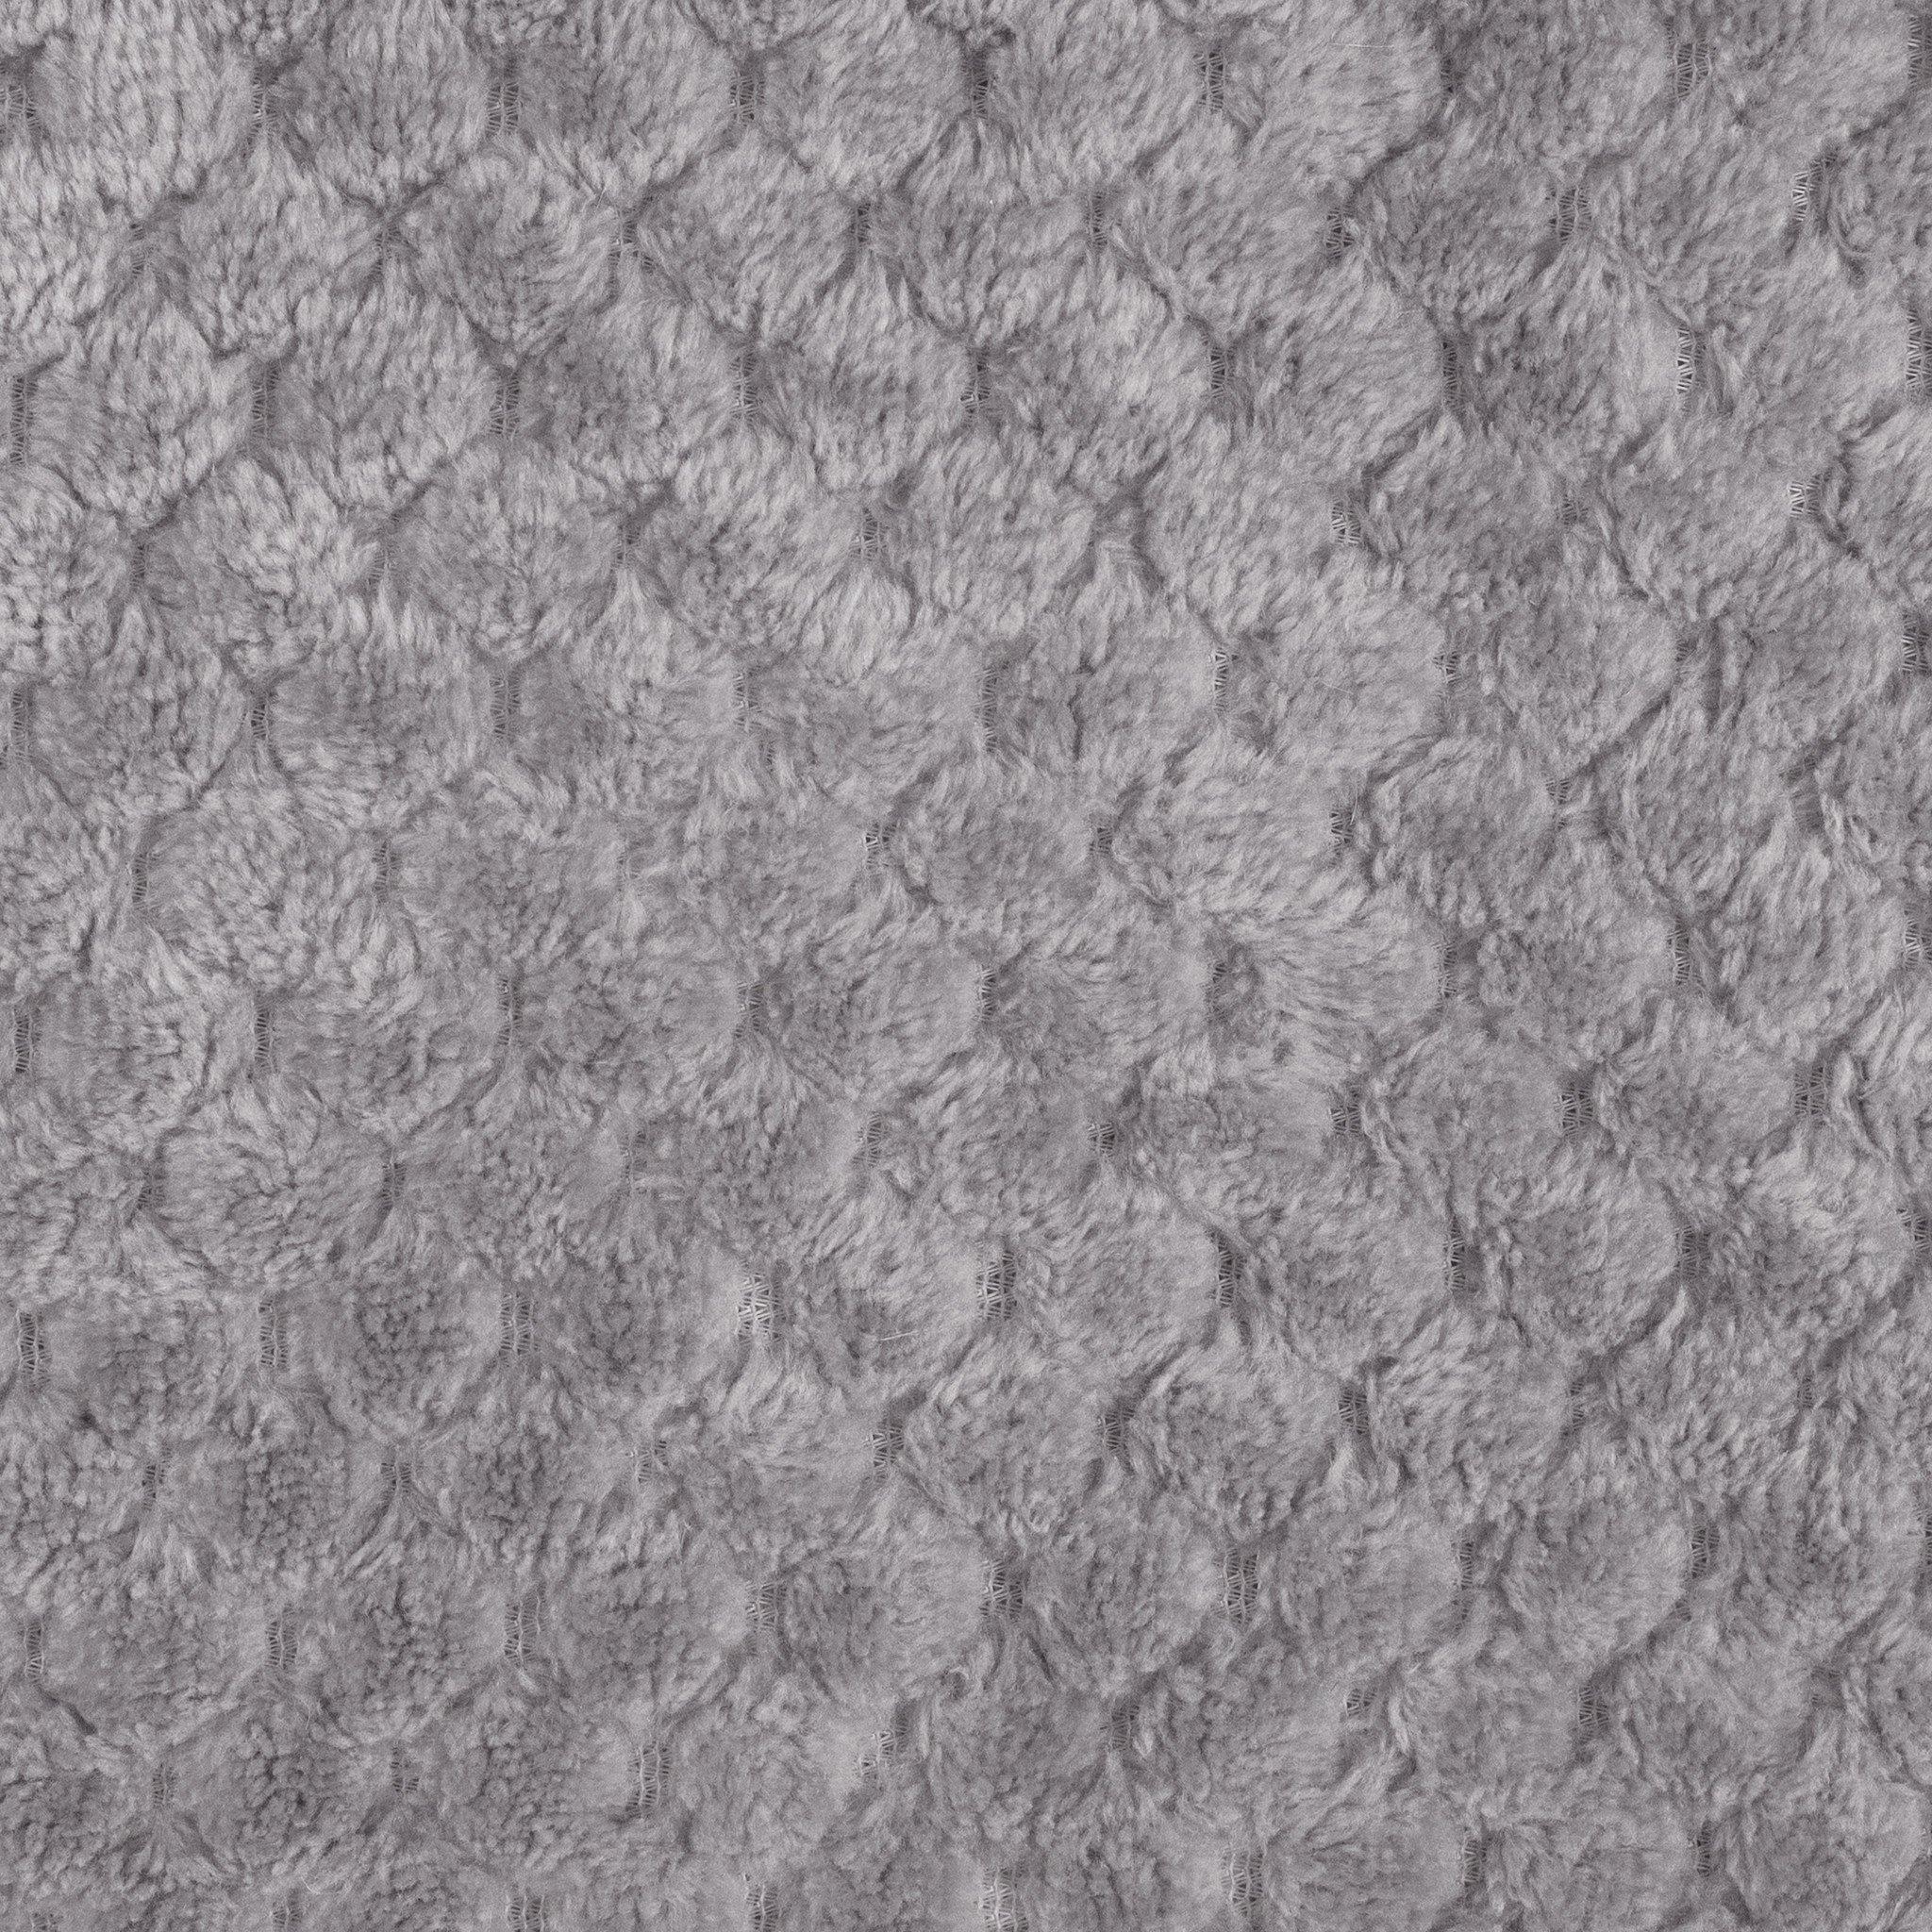 Popcorn Plush and Sherpa Ultra-Soft Baby Blanket | Tadpoles